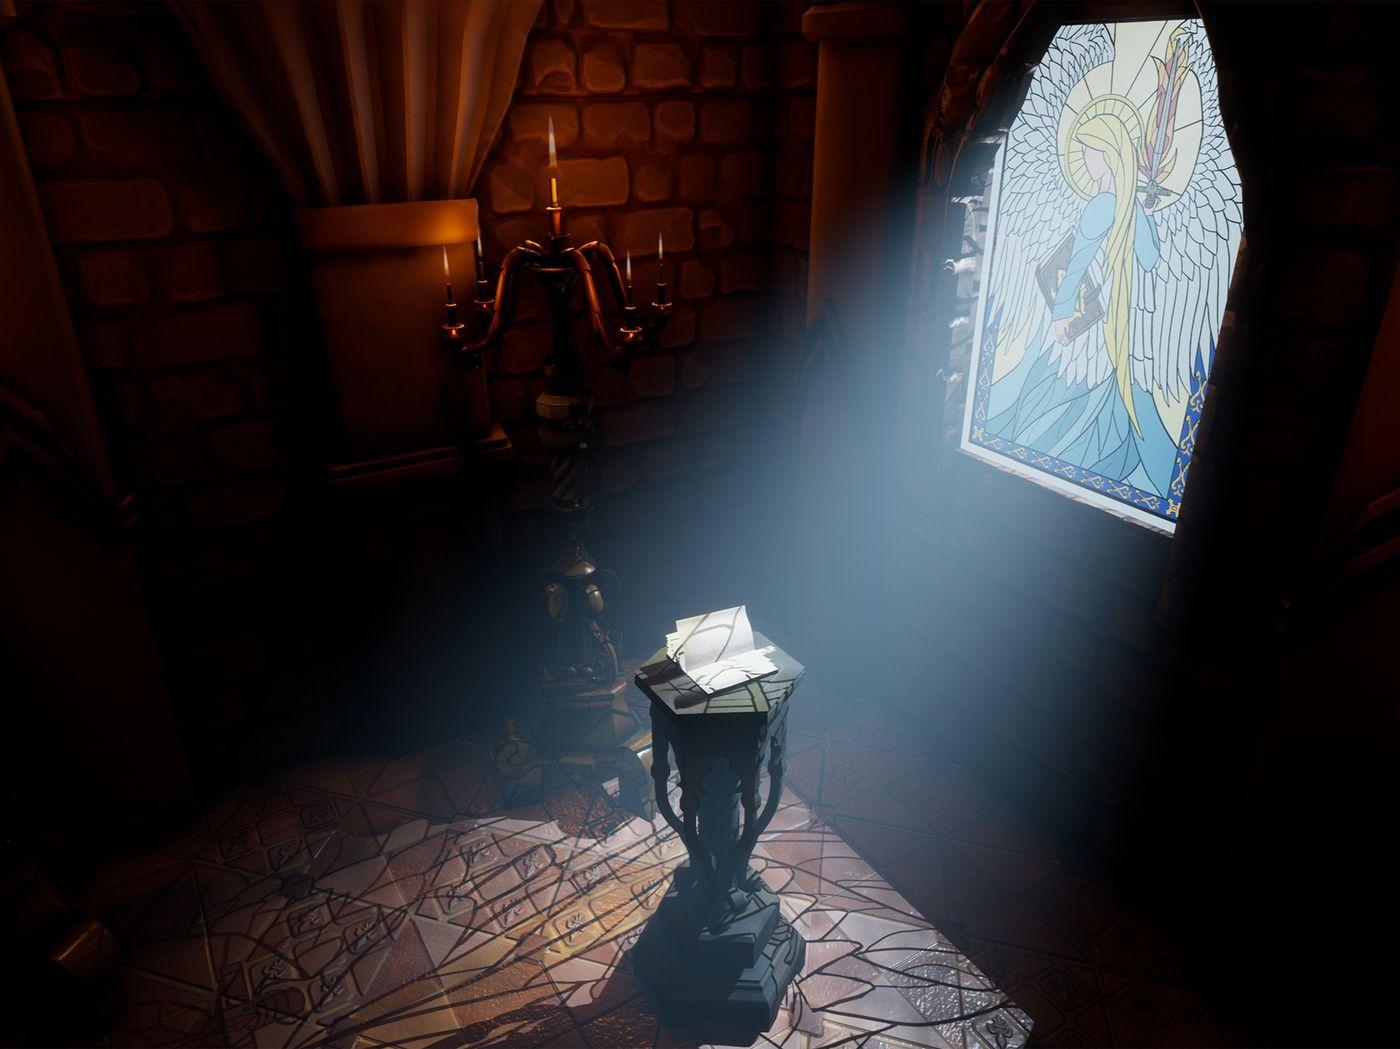 Holy room of prayers